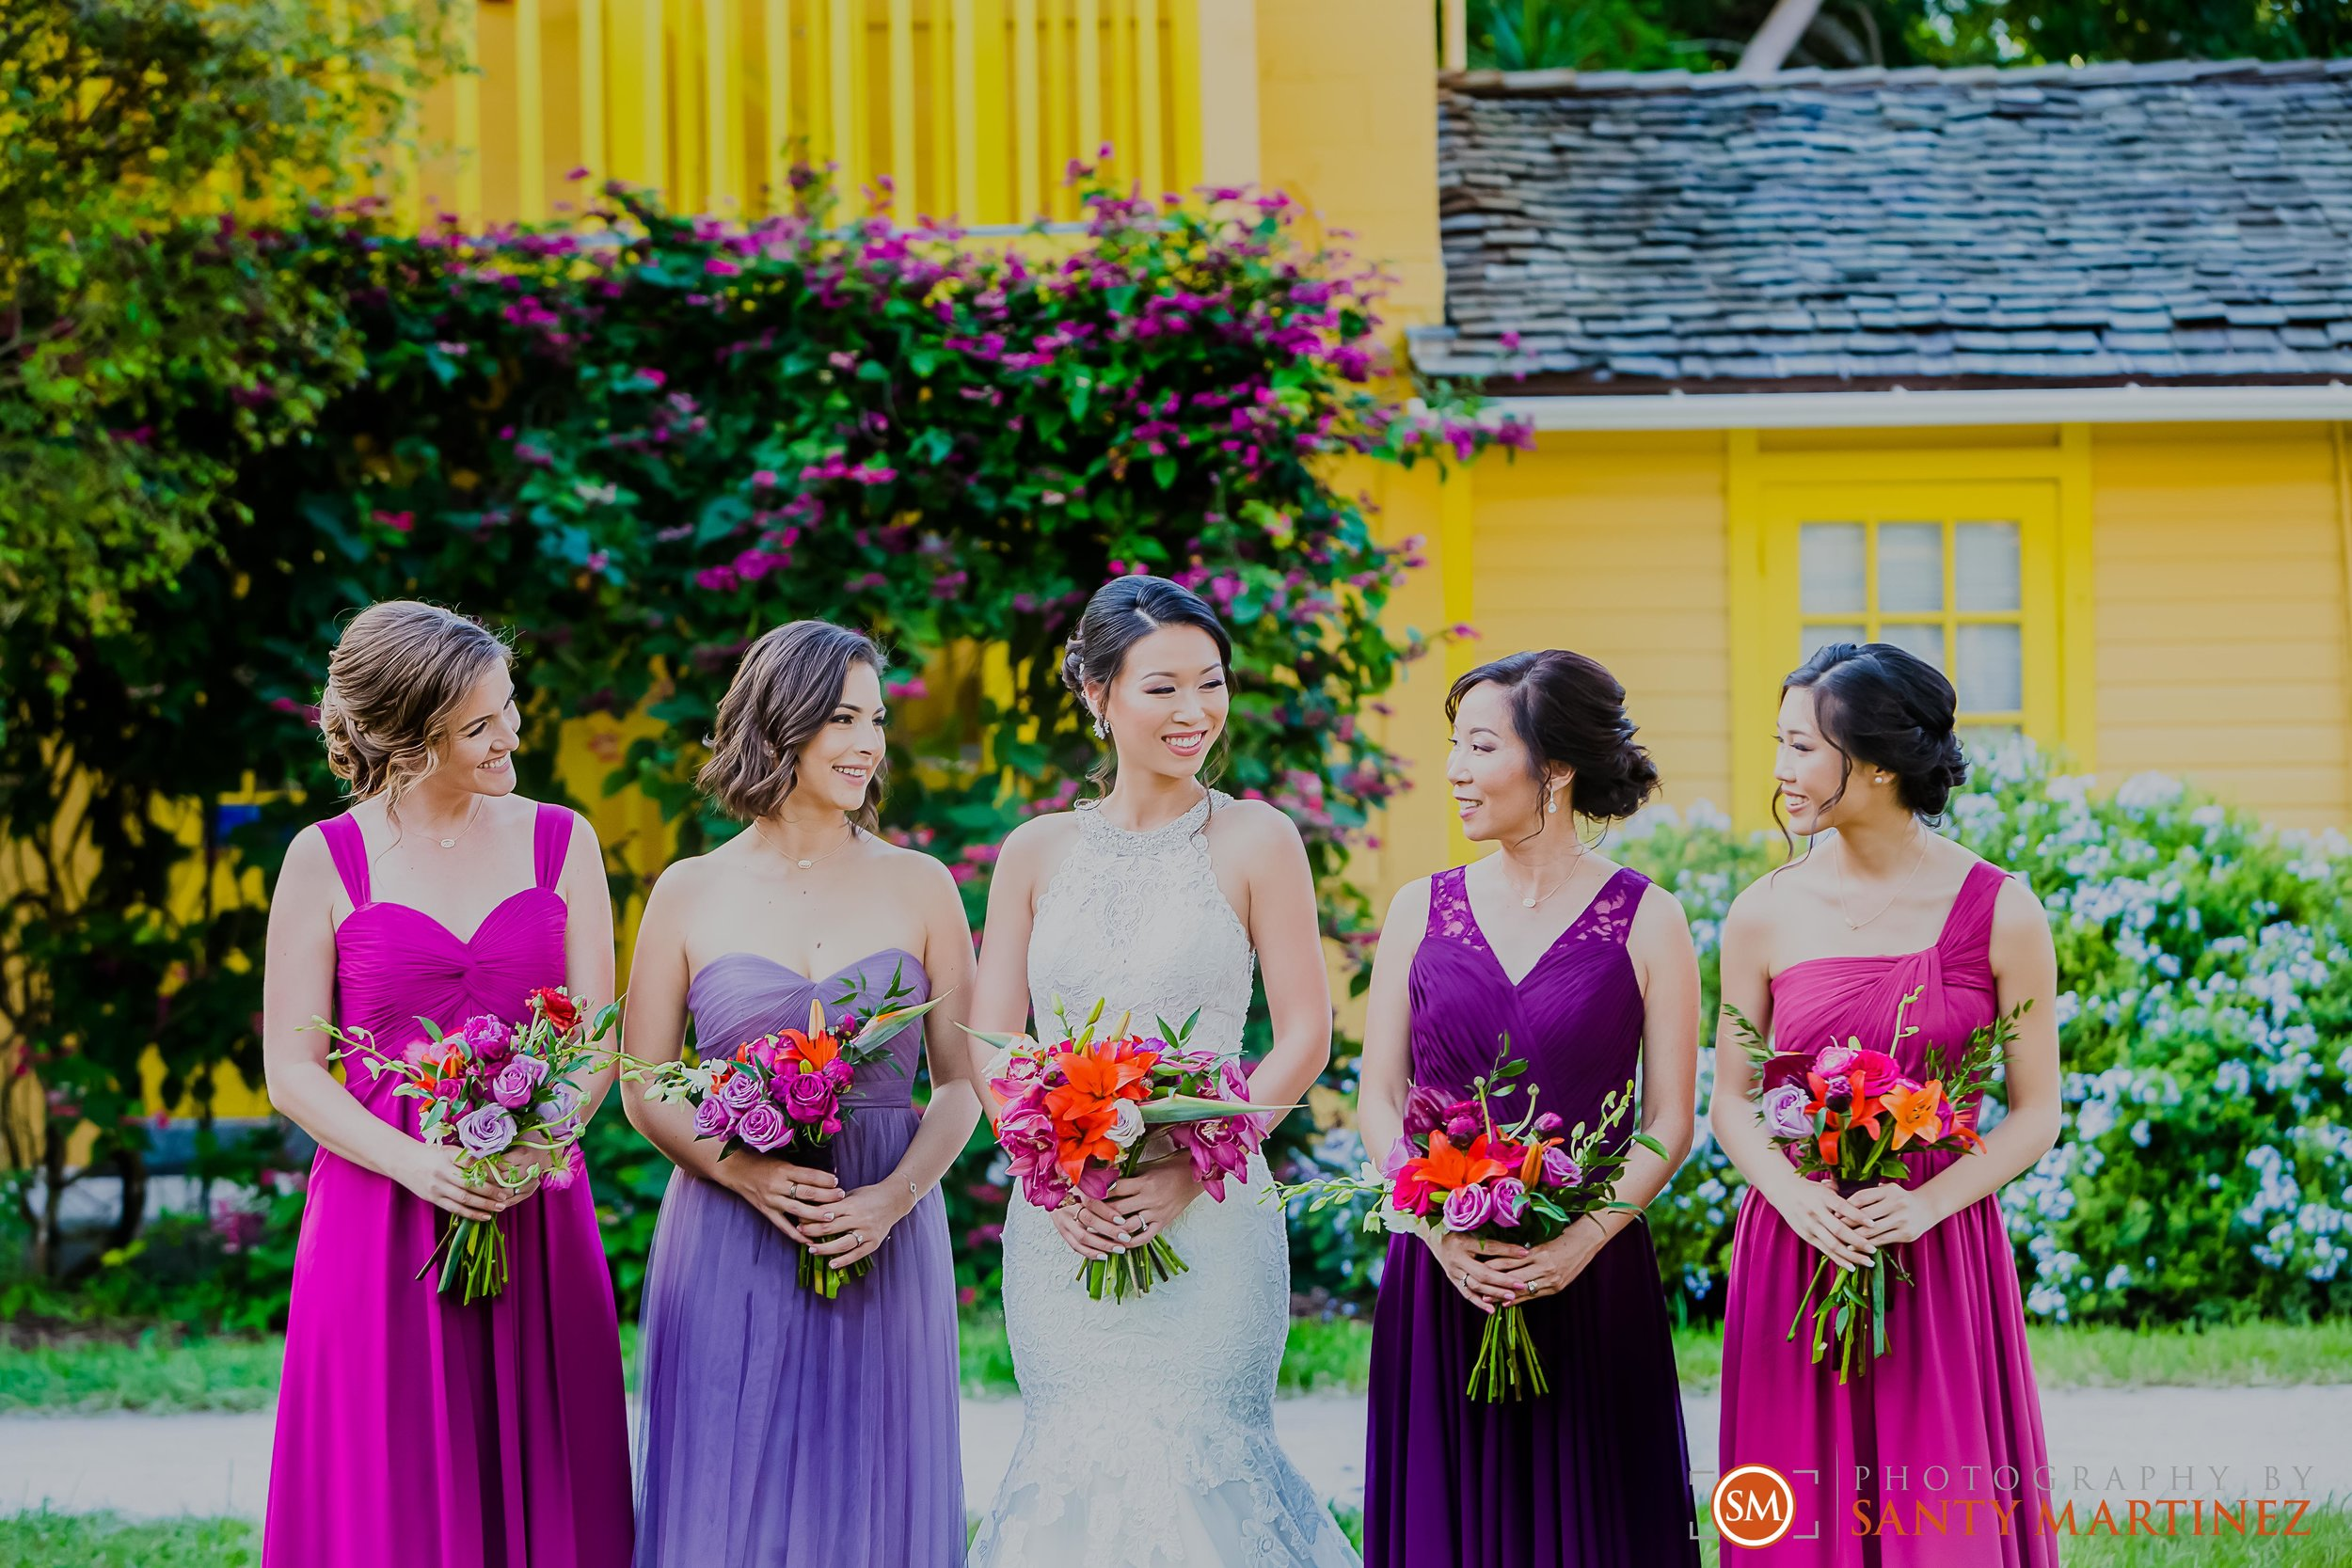 Wedding Bonnet House - Photography by Santy Martinez-21.jpg